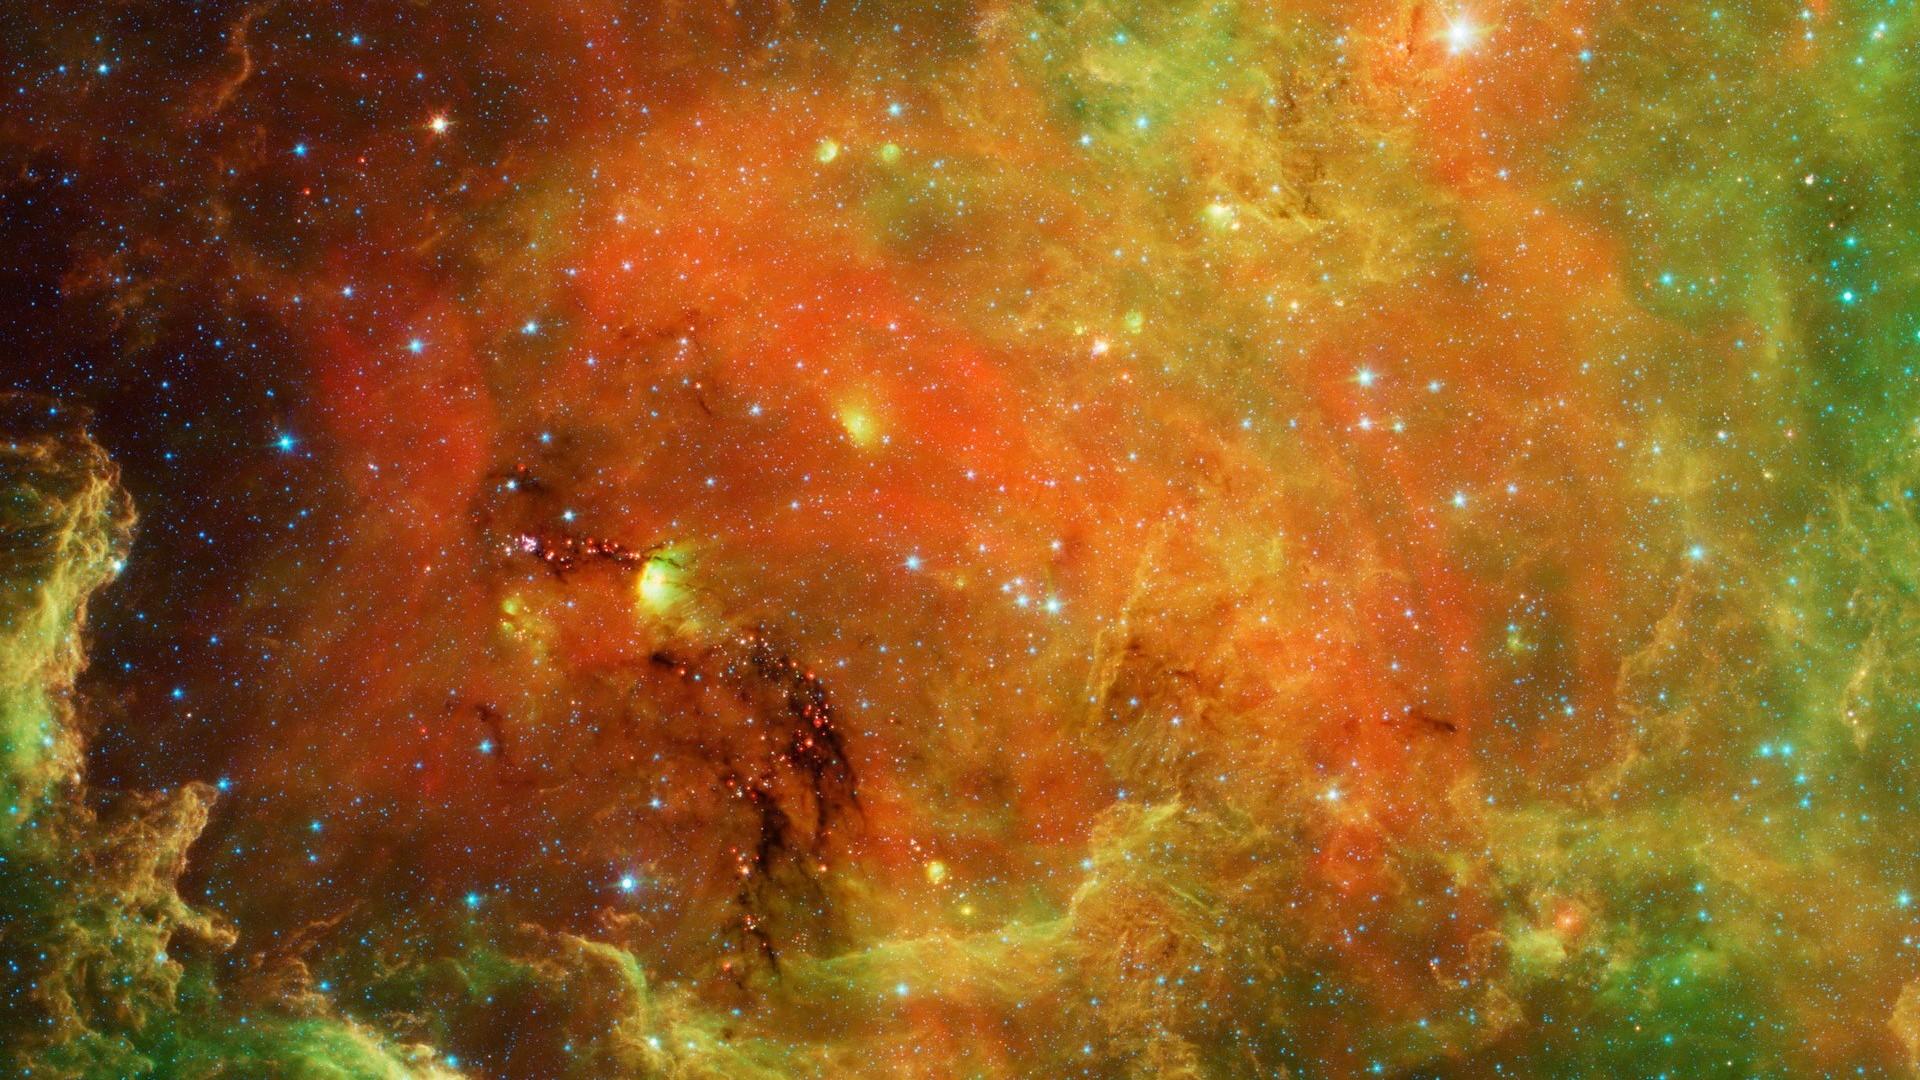 wallpaper orange green nebula and cluster of stars.